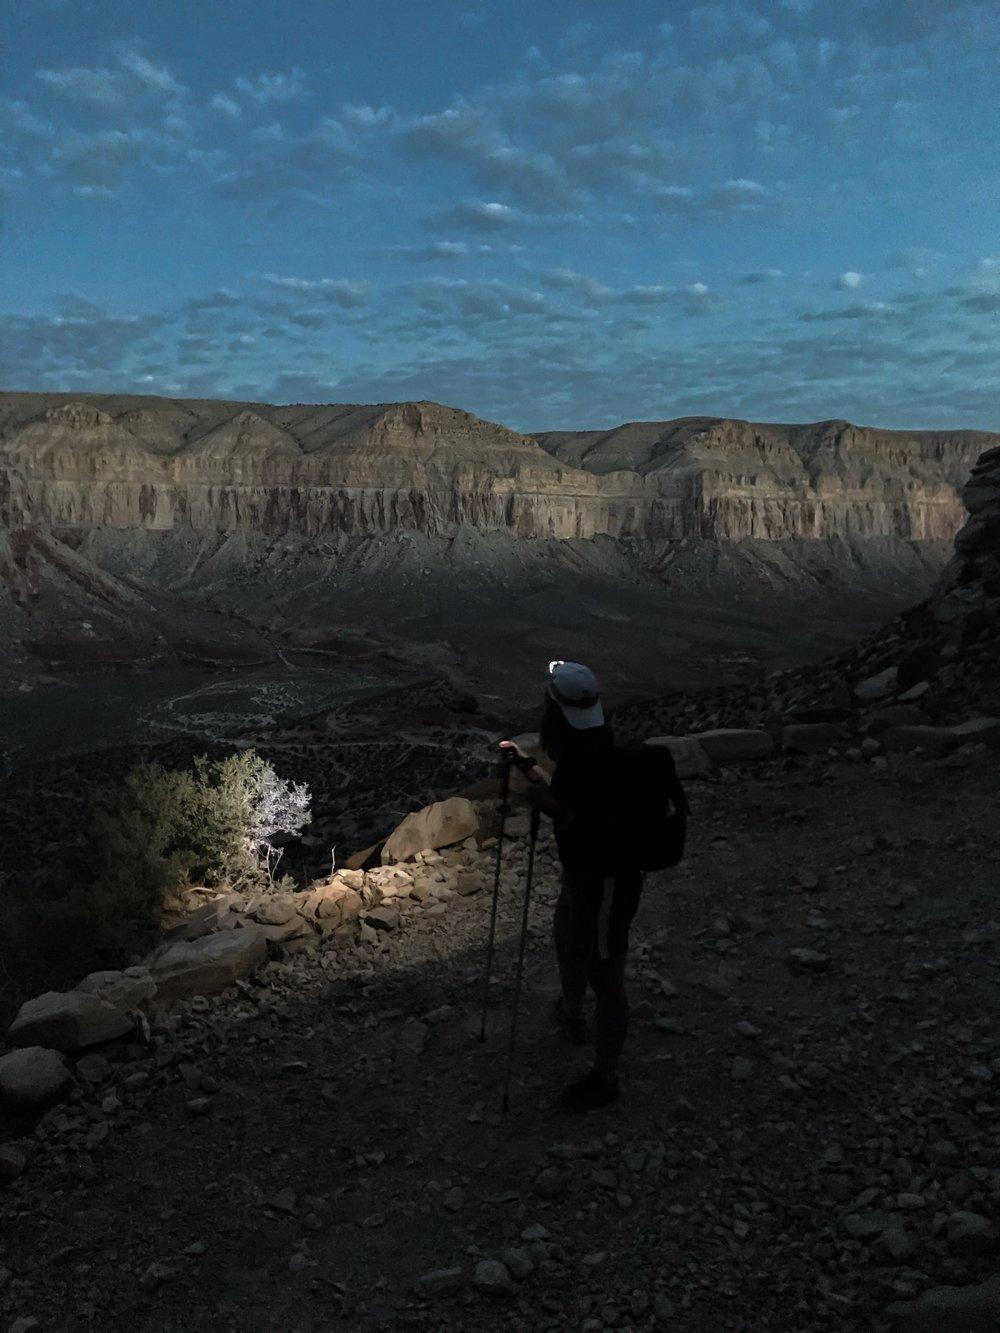 Dawn light over Havasu Canyon. Havasupai Indian Reservation